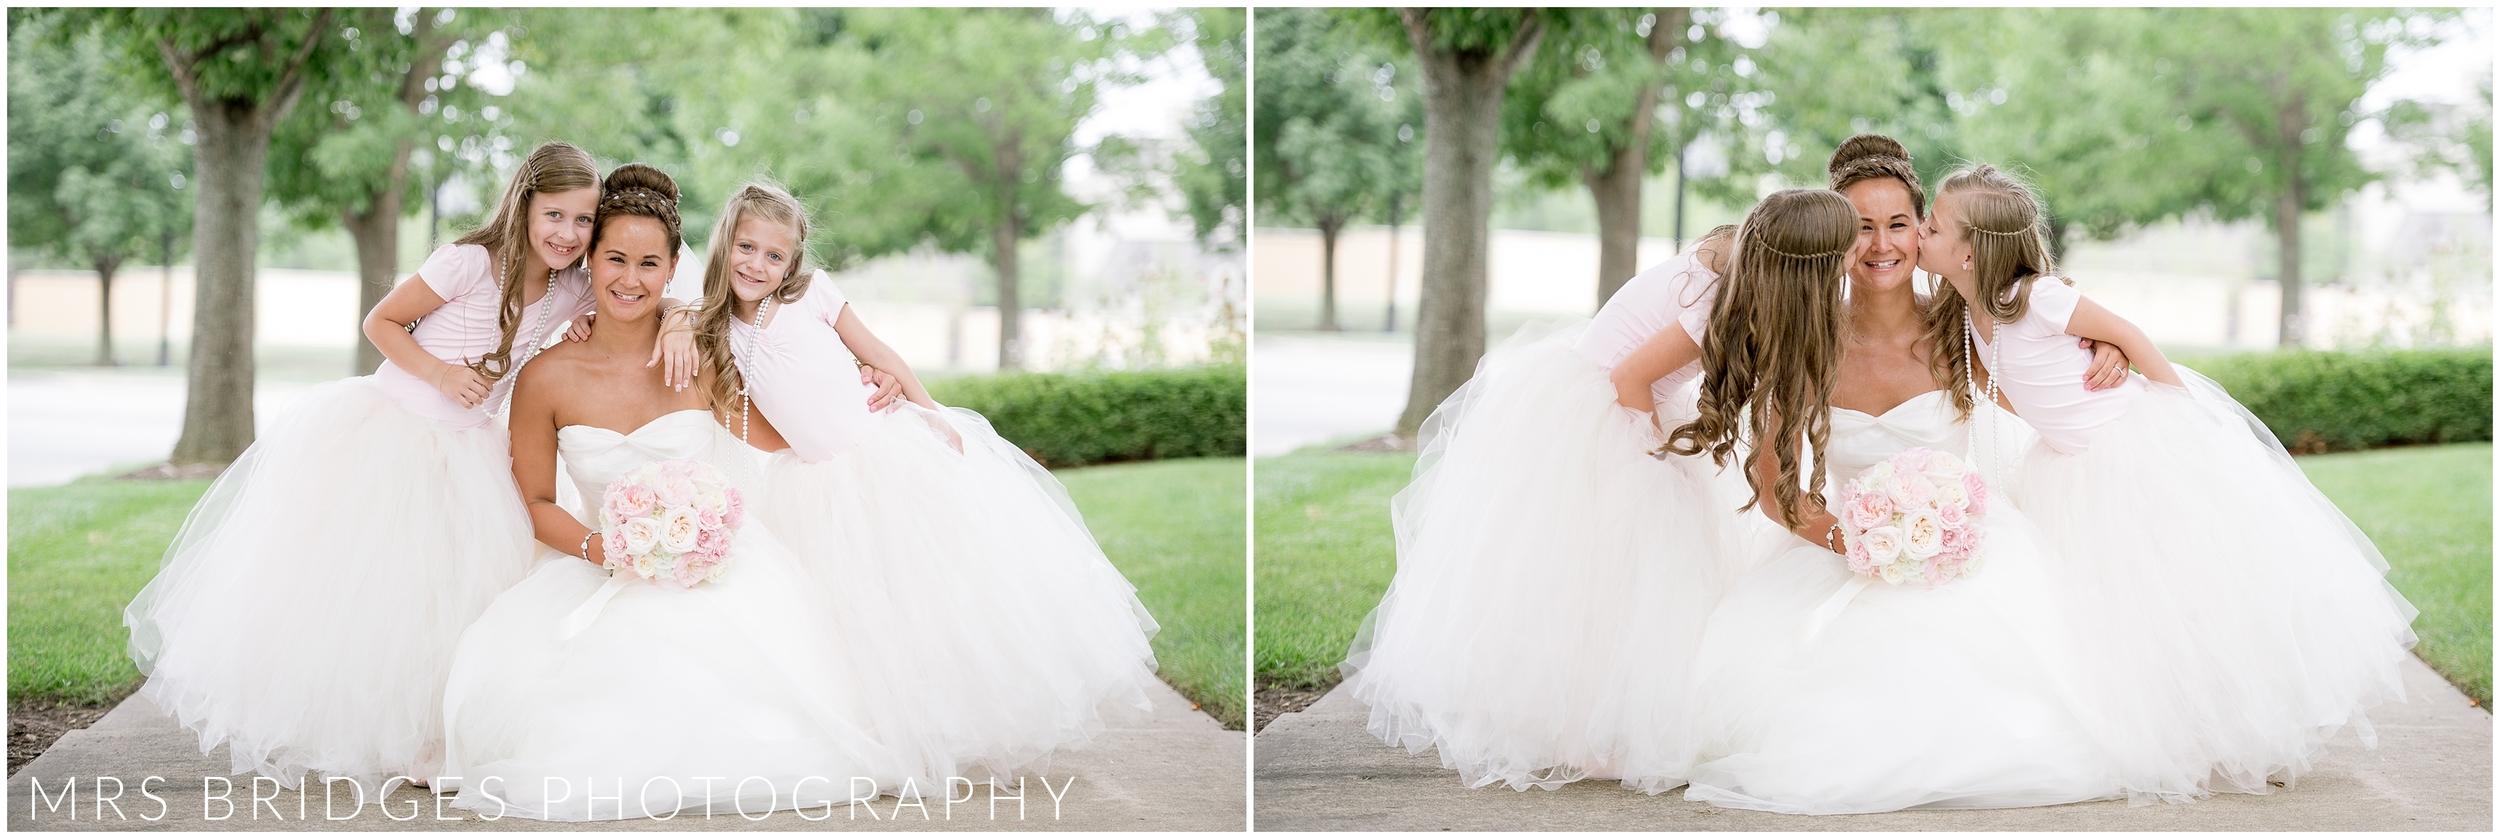 Rebecca_Bridges_Photography__2863.jpg